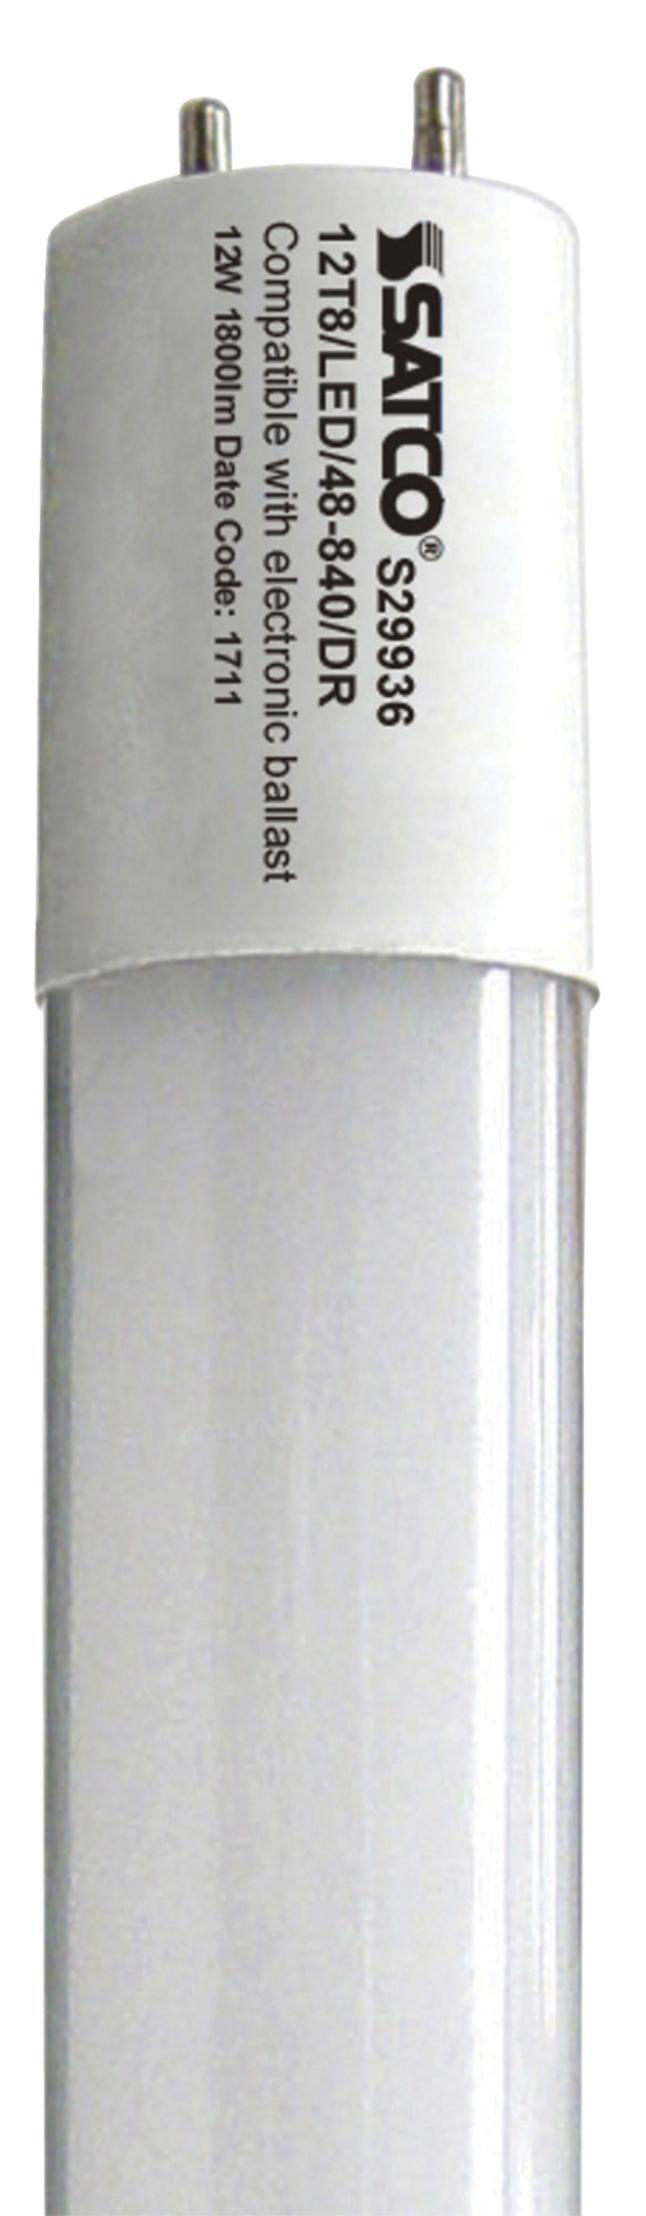 Light Bulbs, Item Number 2008560